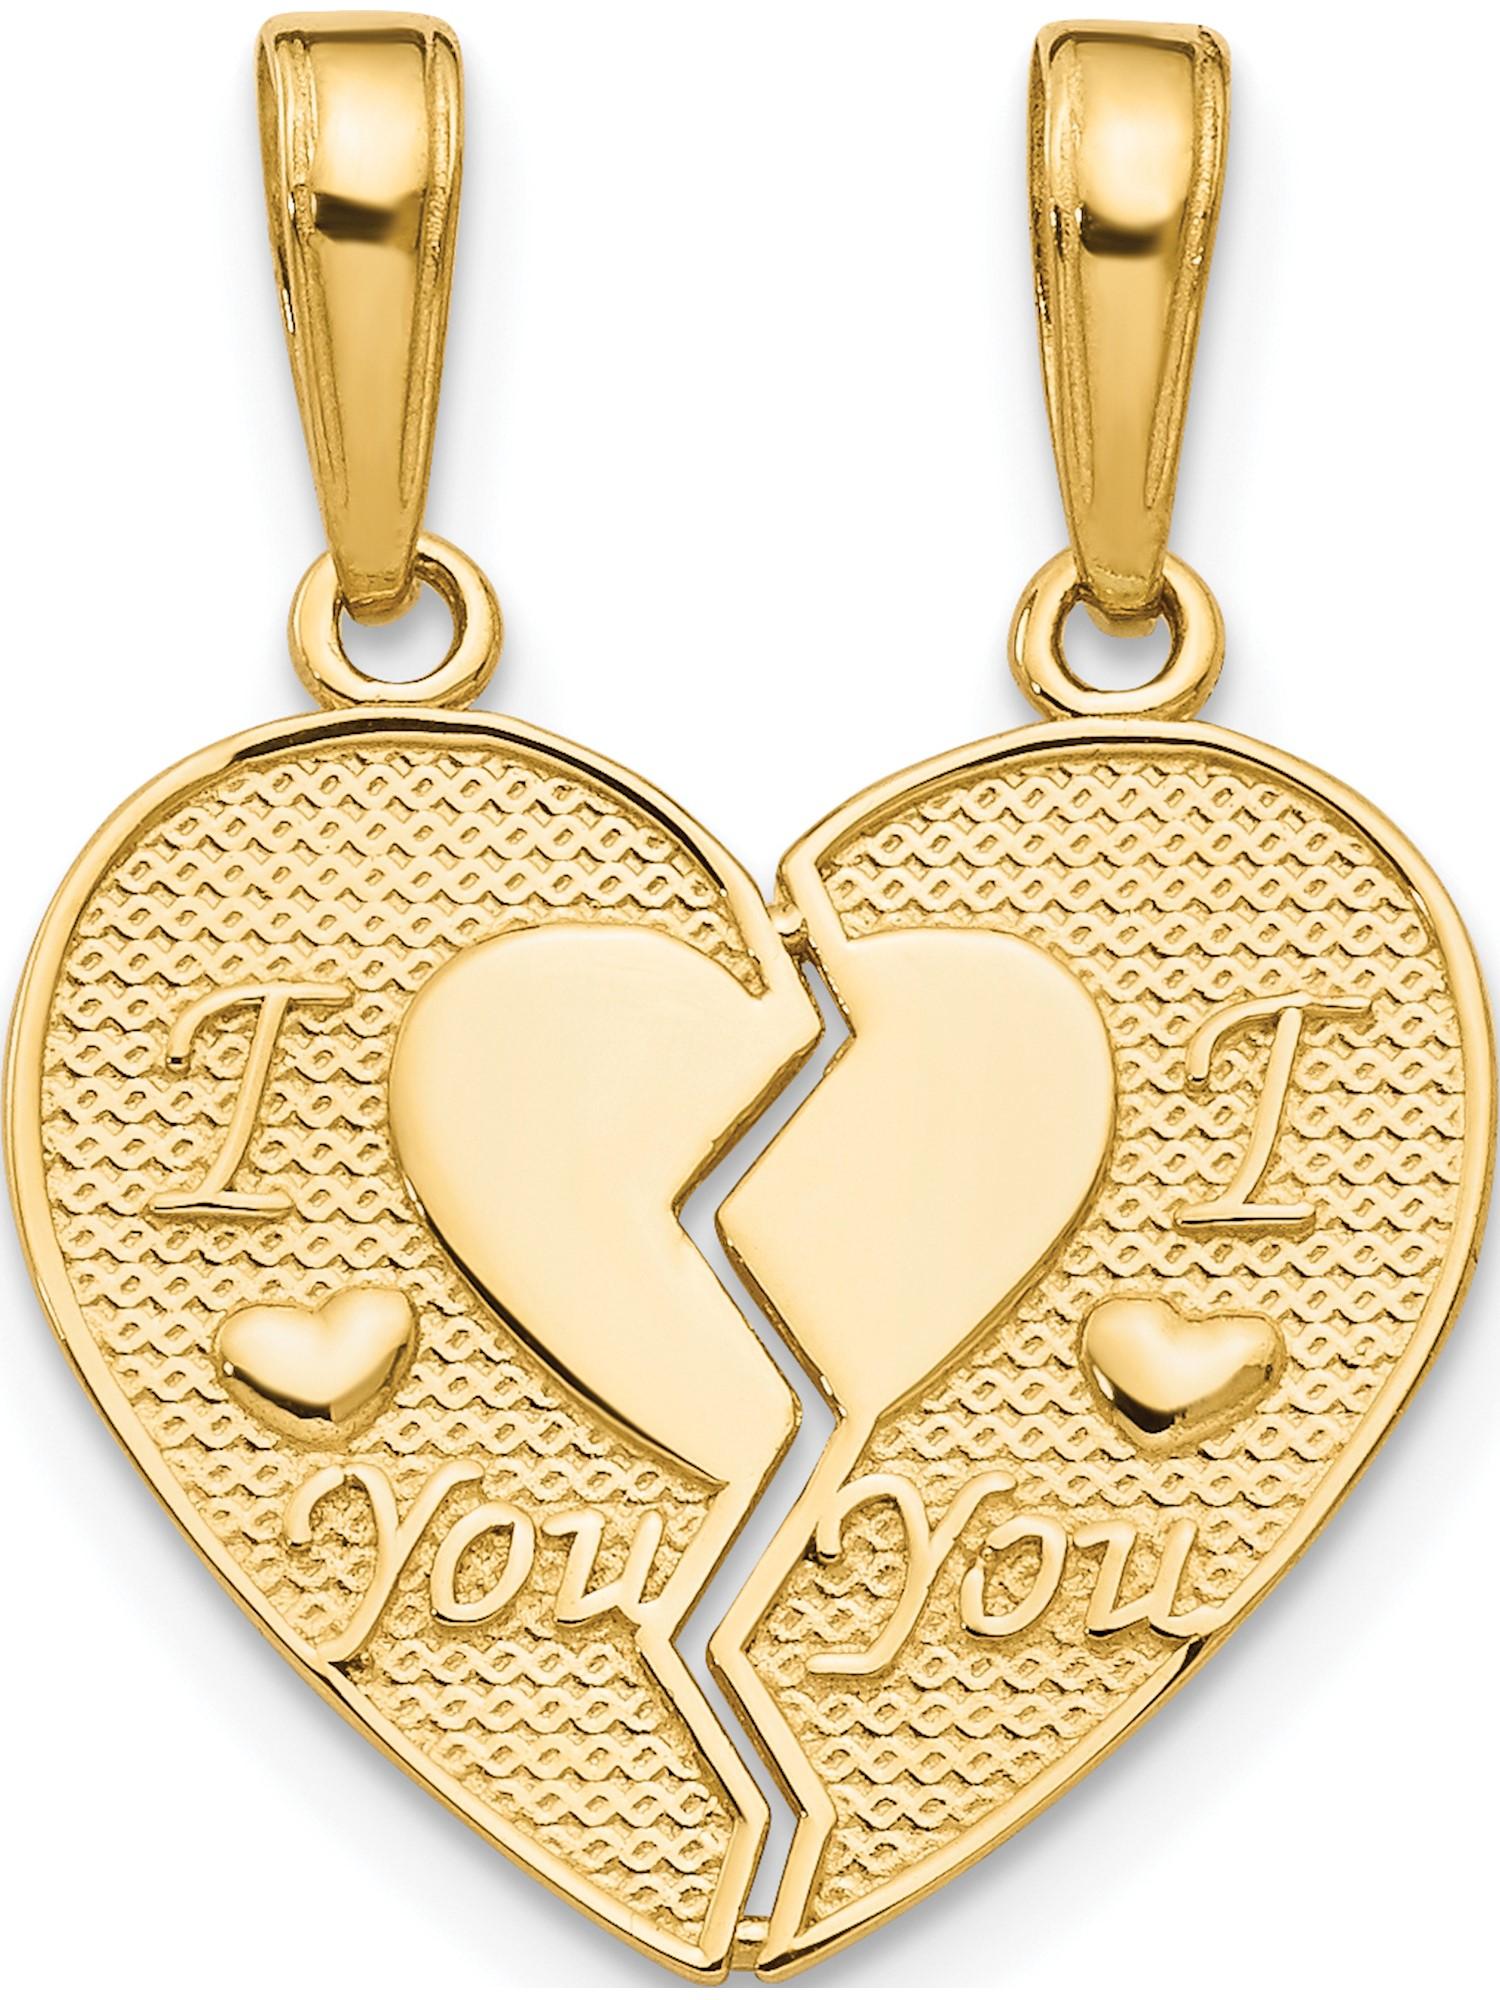 14k Yellow Gold Flat Back Heart Charm Pendant 16mm